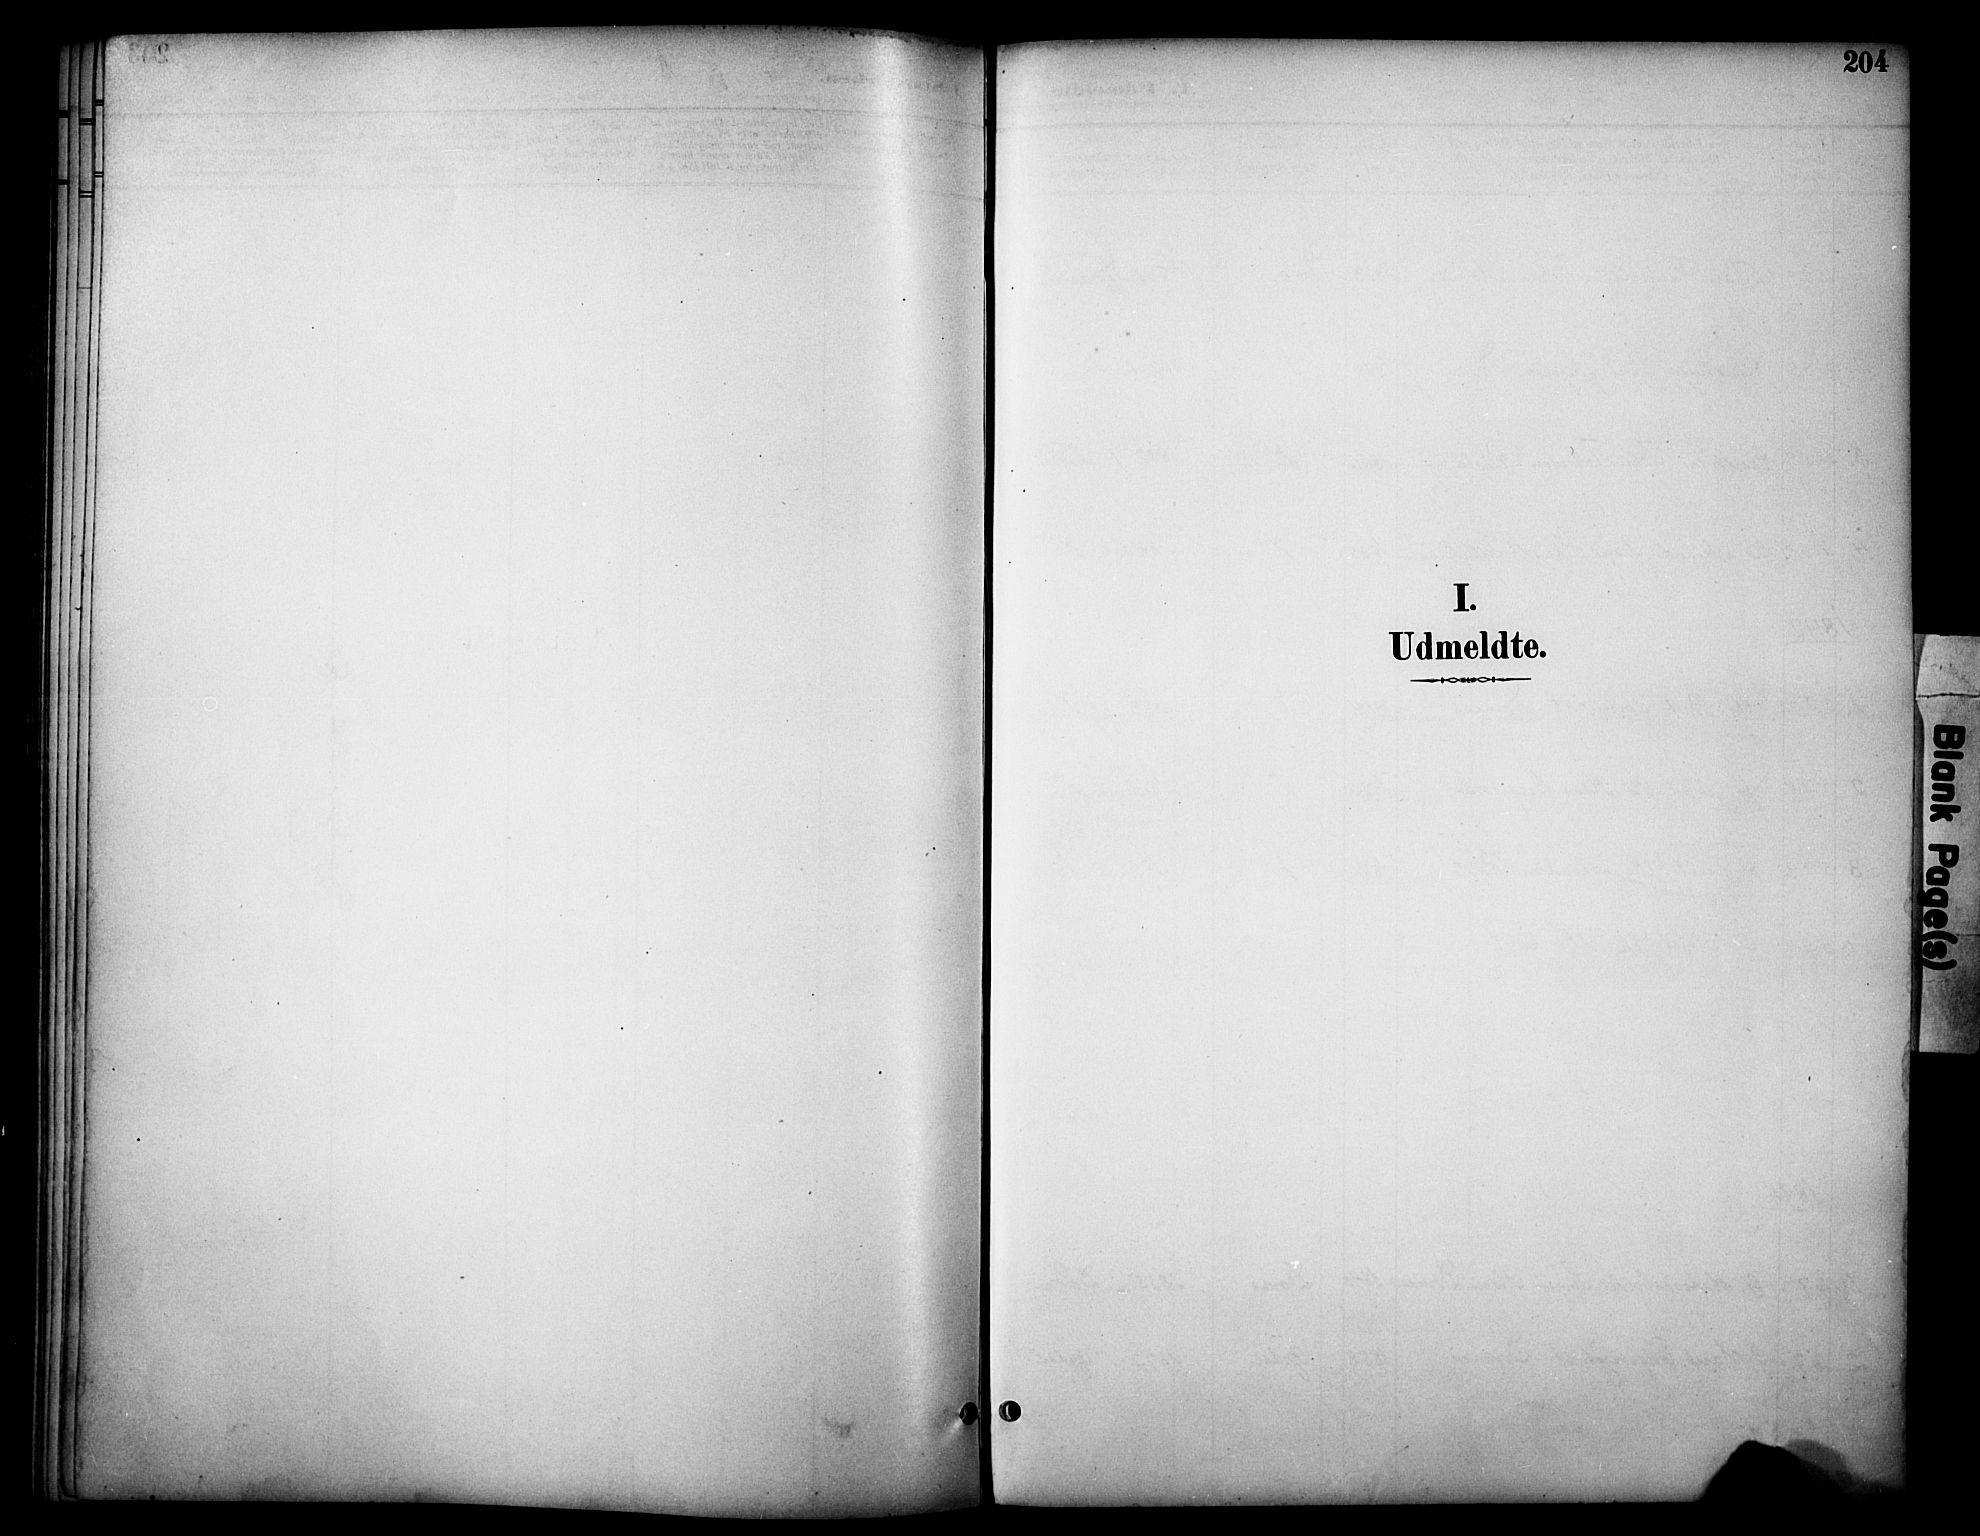 SAH, Dovre prestekontor, Ministerialbok nr. 3, 1891-1901, s. 204